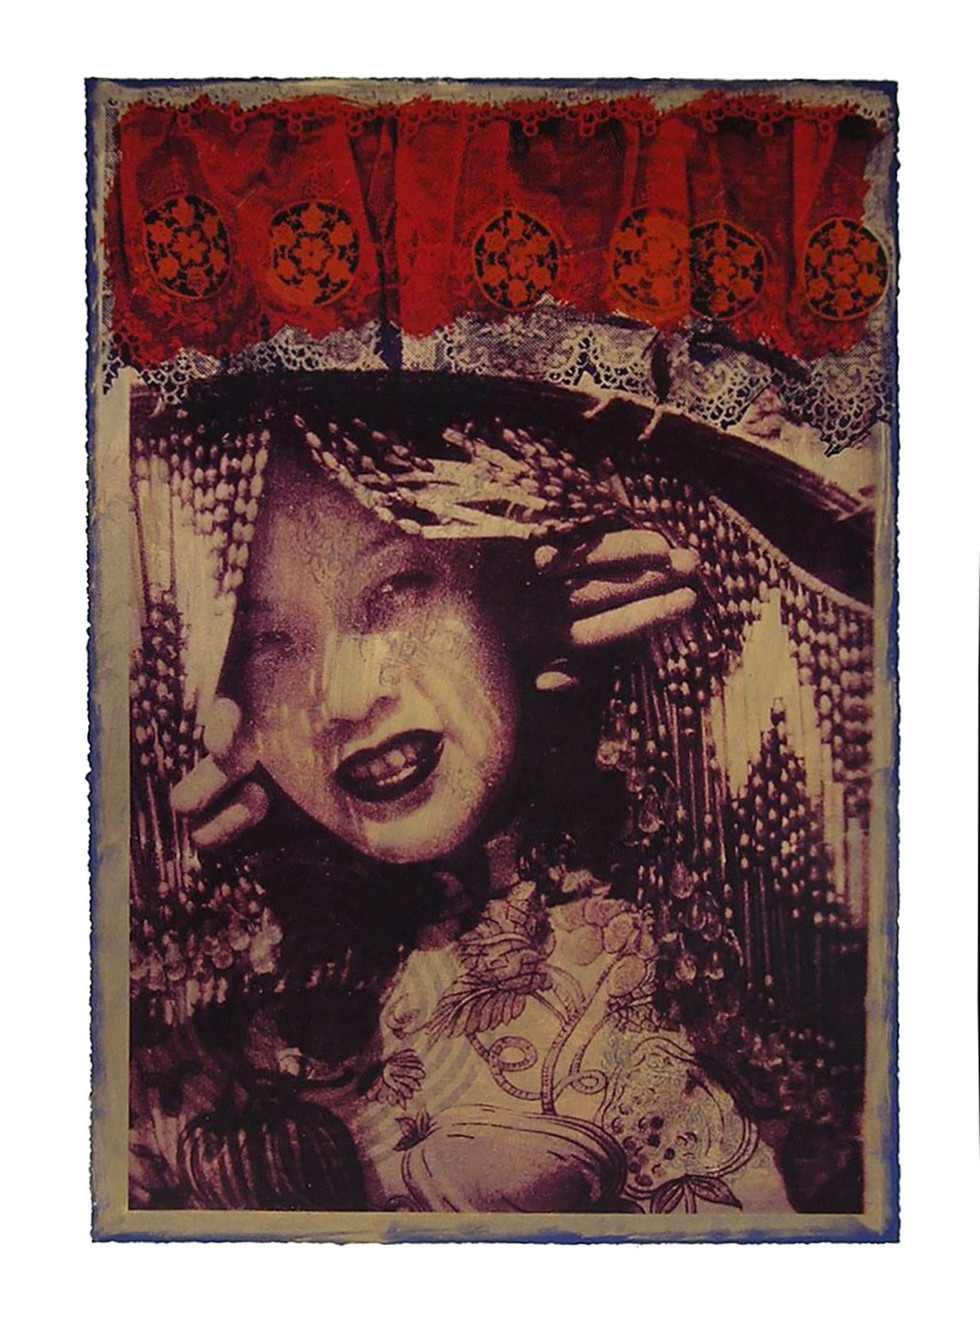 Jane Sampson 'China Girl' Screenprint 56 x 76cm edn 20